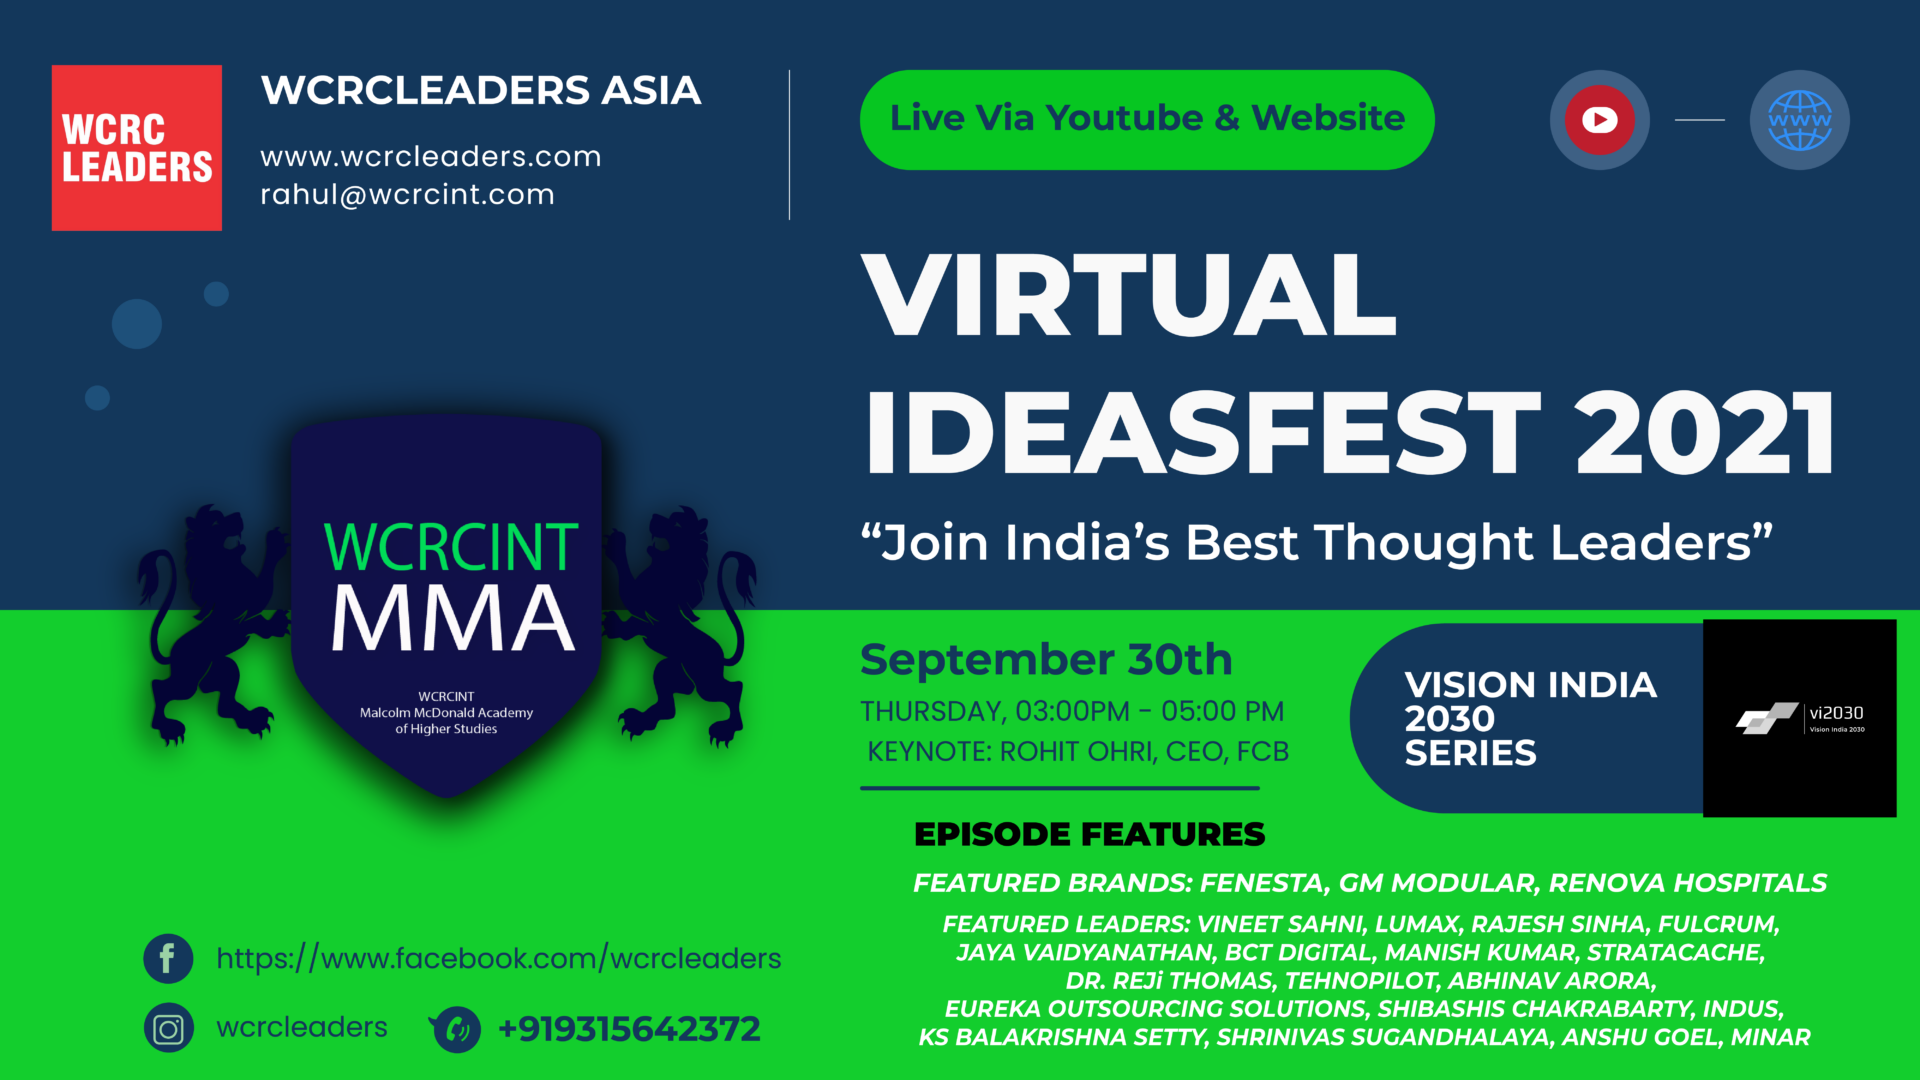 Poster VI 2030 Ideasfest